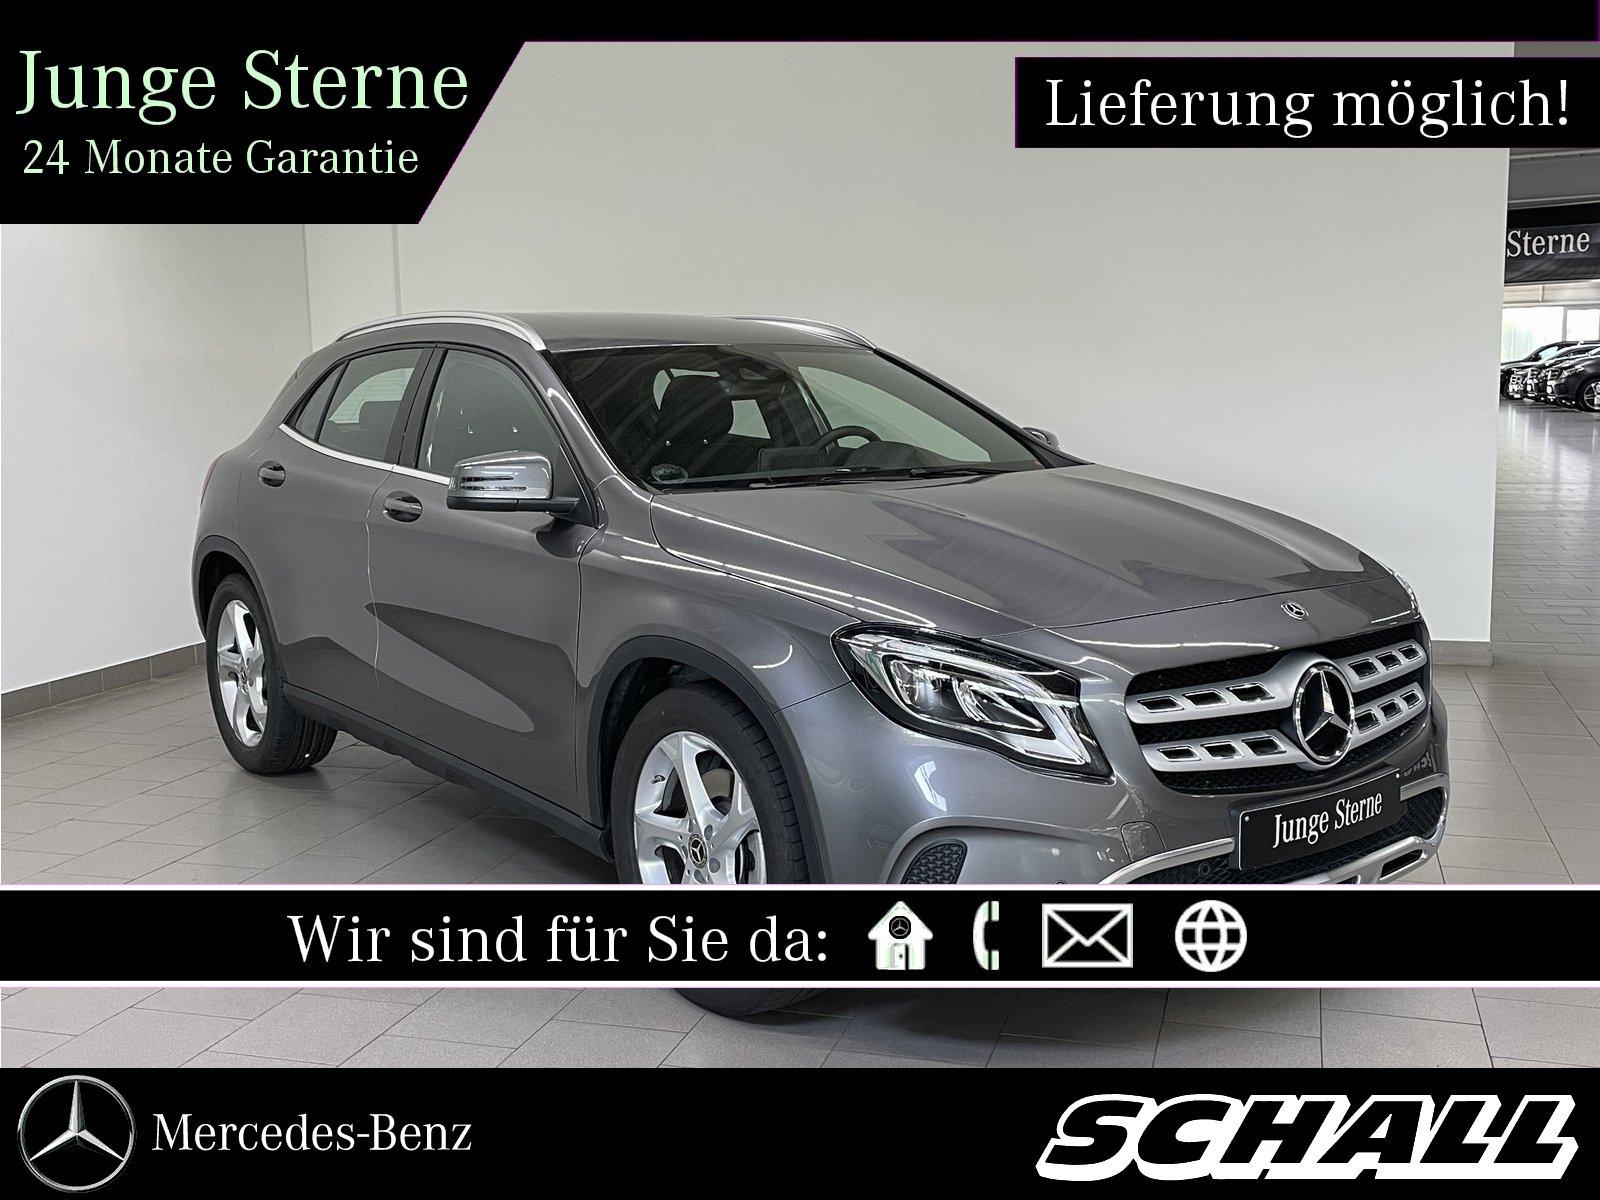 Mercedes-Benz GLA 250 4M URBAN+LED HIGH PERF+NAVI+PARK-PILOT, Jahr 2019, Benzin